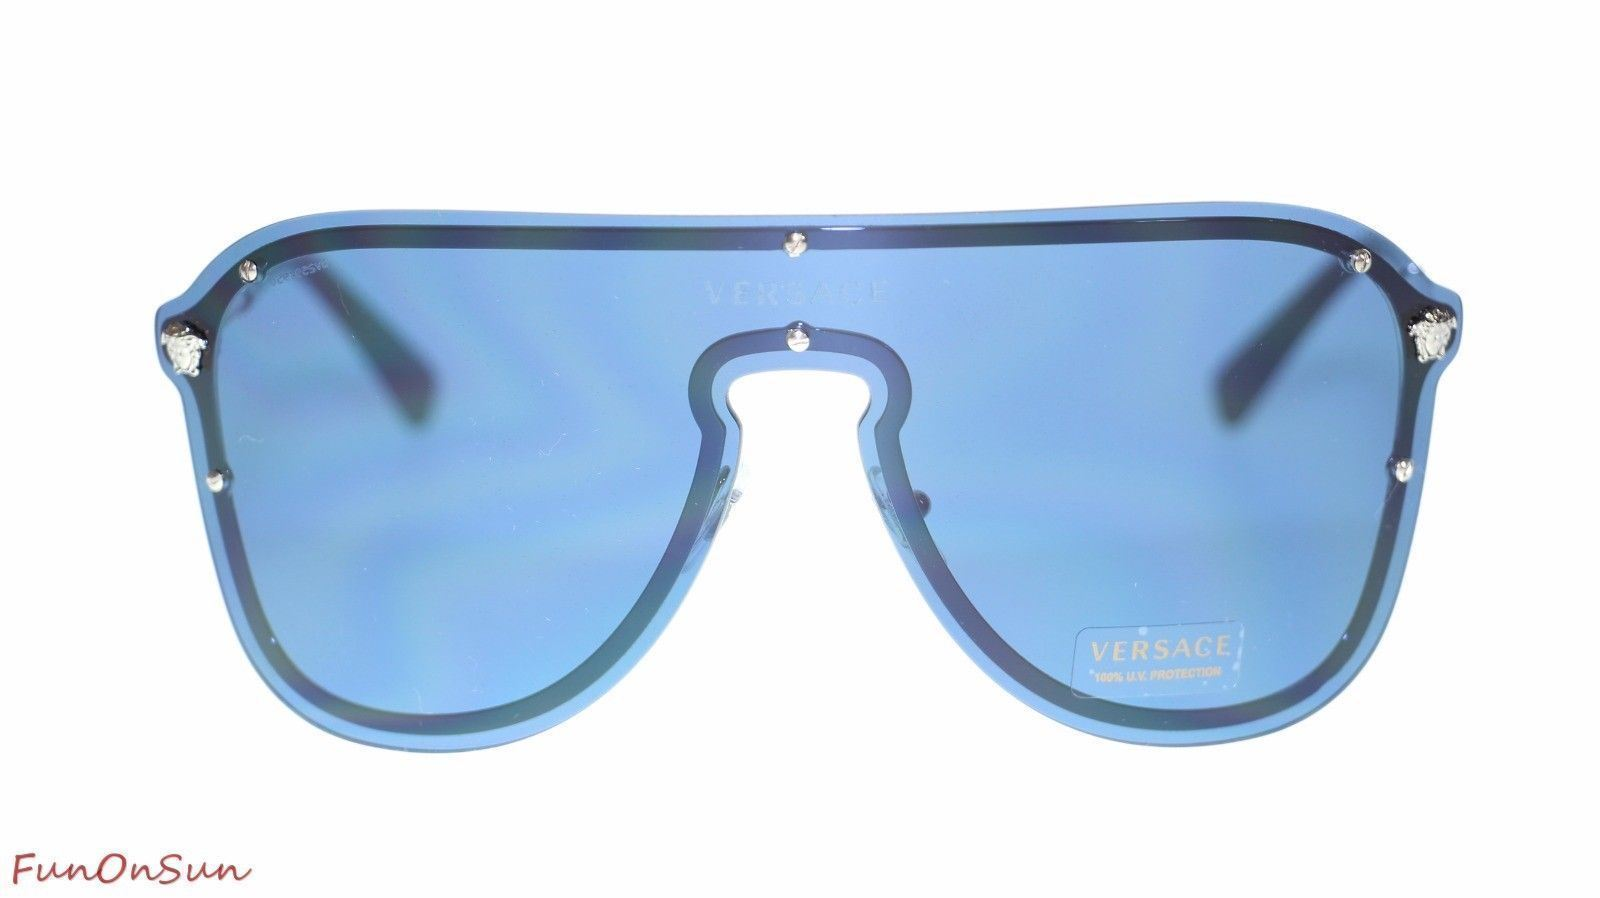 86dbb6fe8f Versace Pilot Women Sunglasses VE2180 100080 and 50 similar items. S l1600